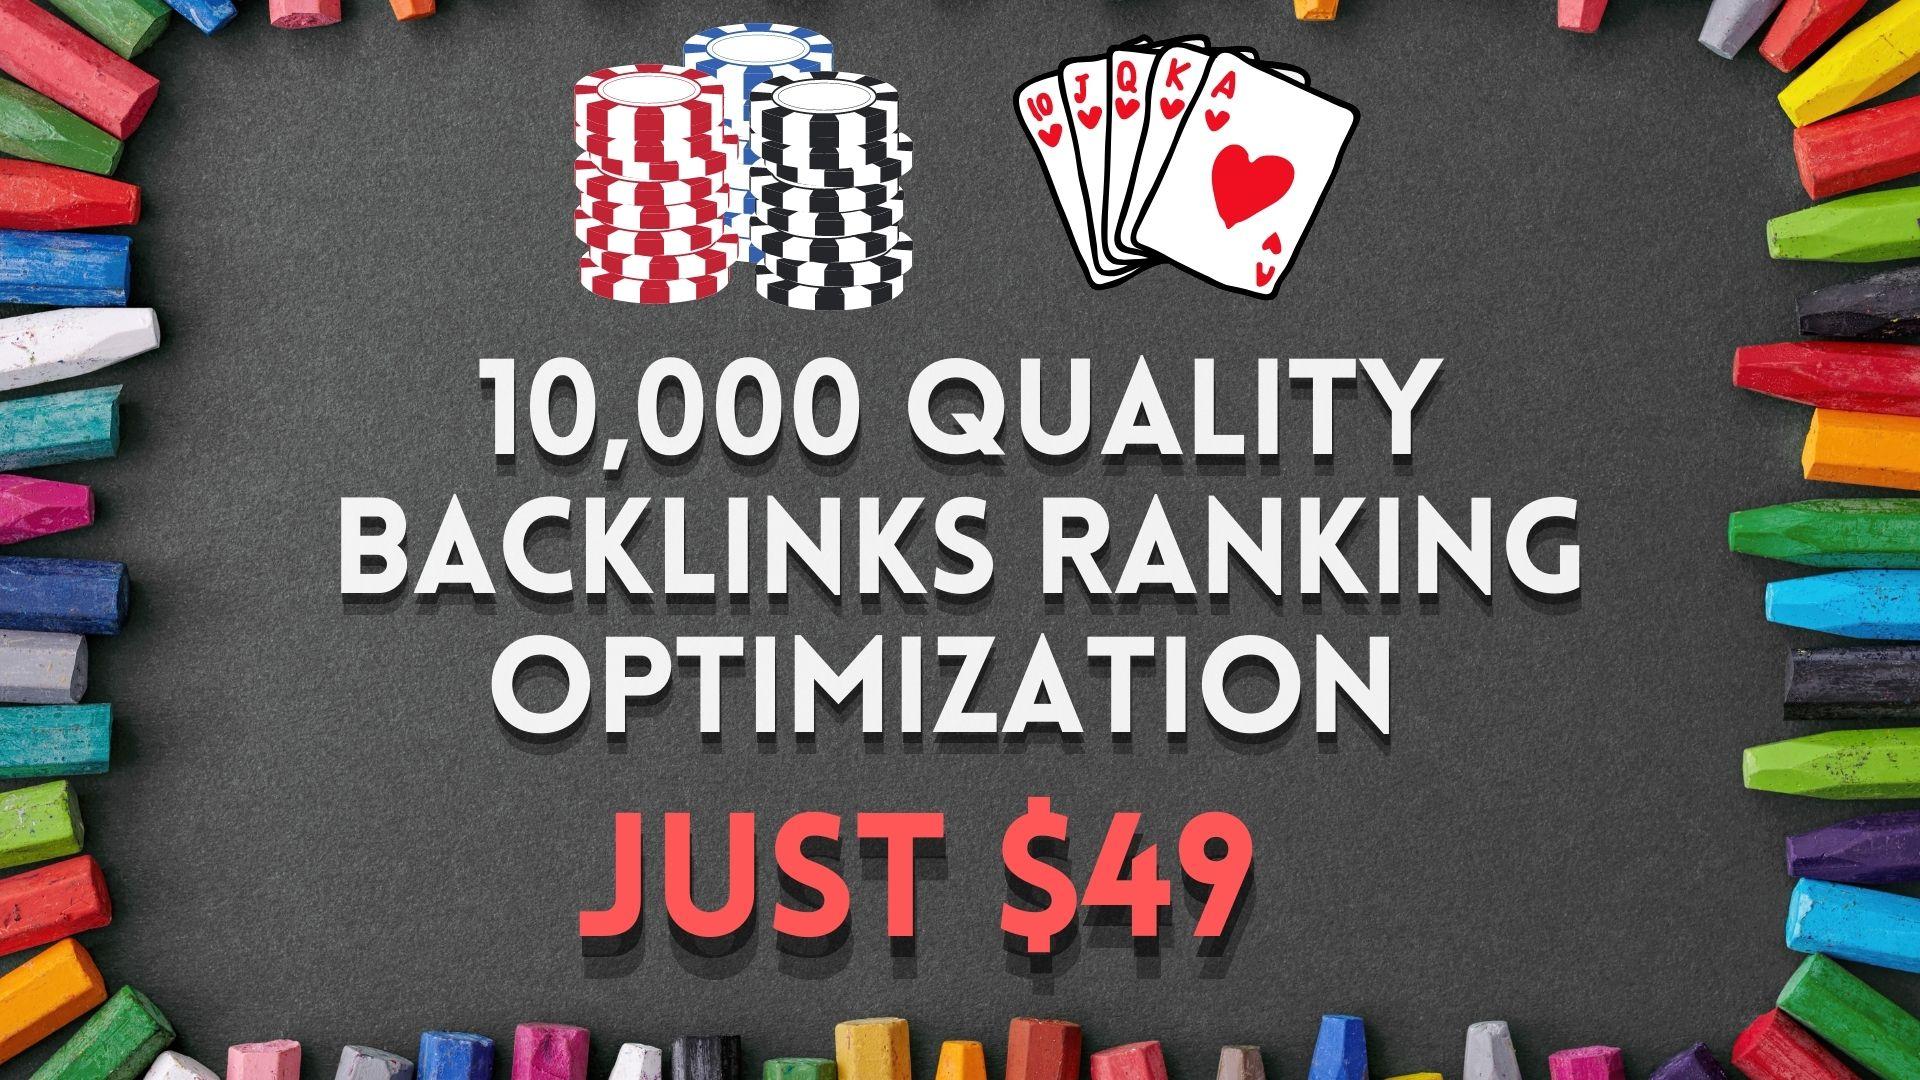 Poker/Casino 10,000 quality backlinks ranking optimization in 2021